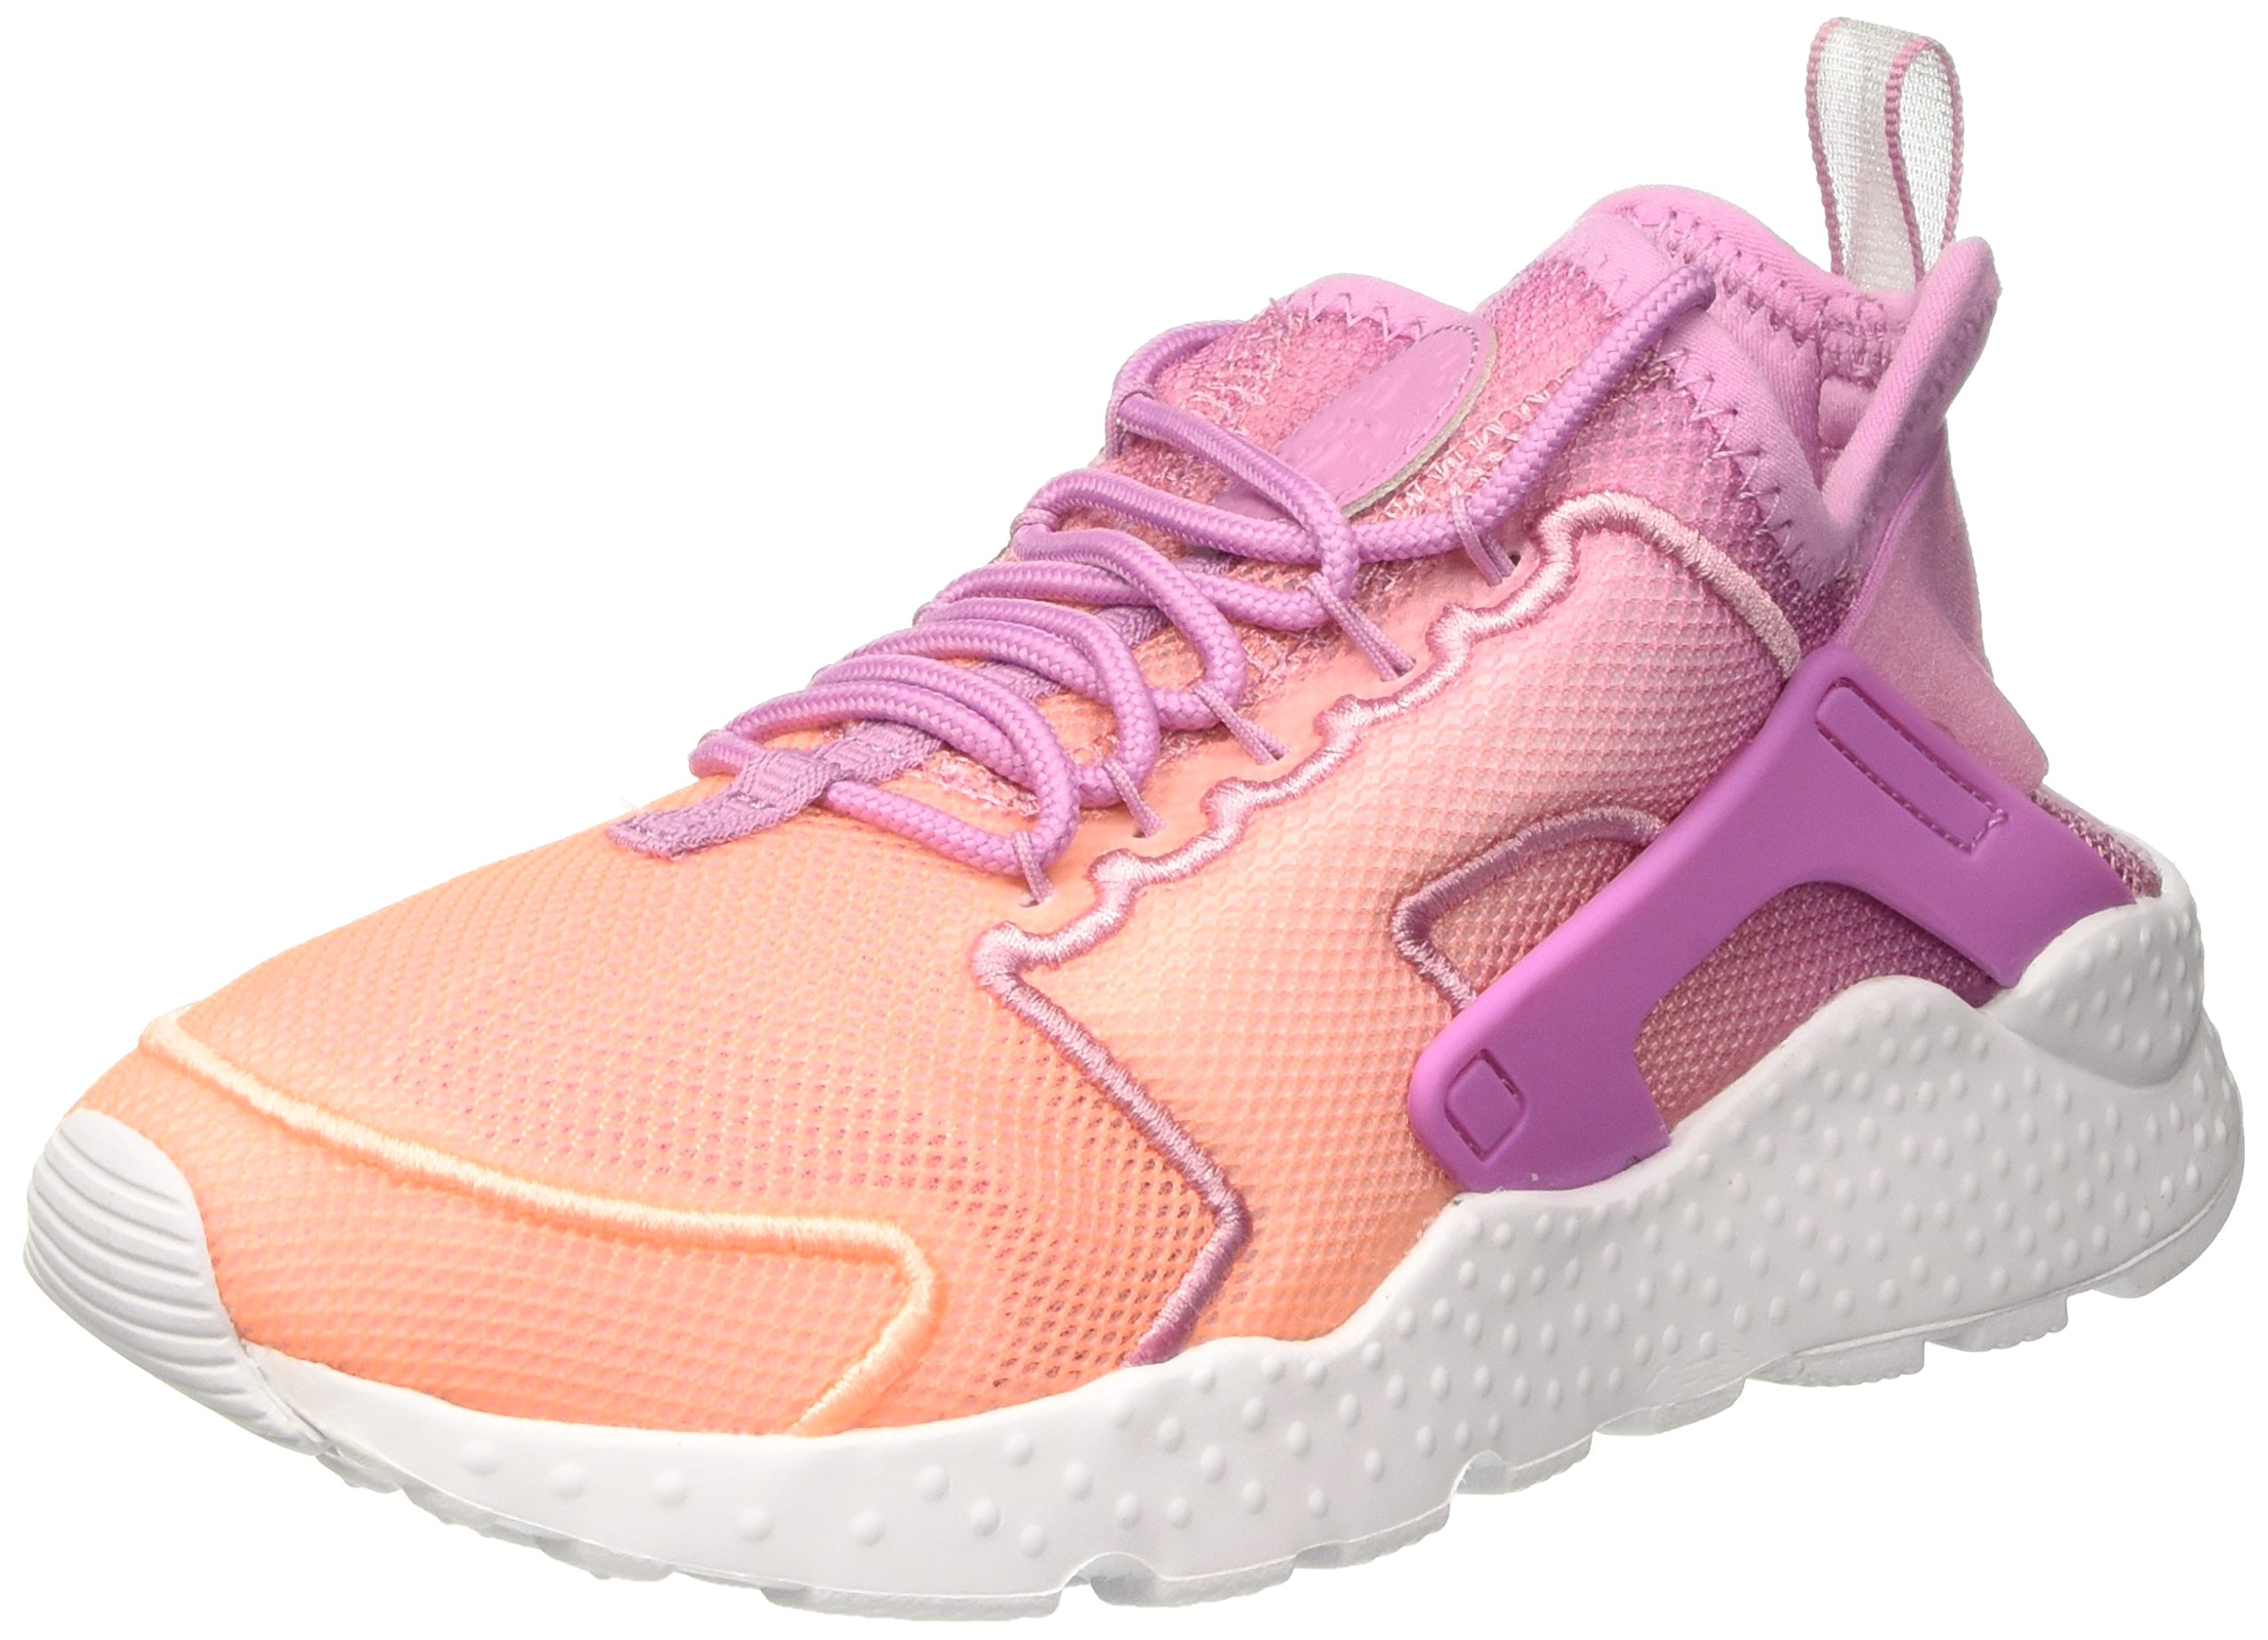 sale retailer 13235 20a72 Nike Damen WMNS Air Huarache Run Ultra Br Trainer Mehrfarbig OrchidSunset  GlowWhite, 39 EU